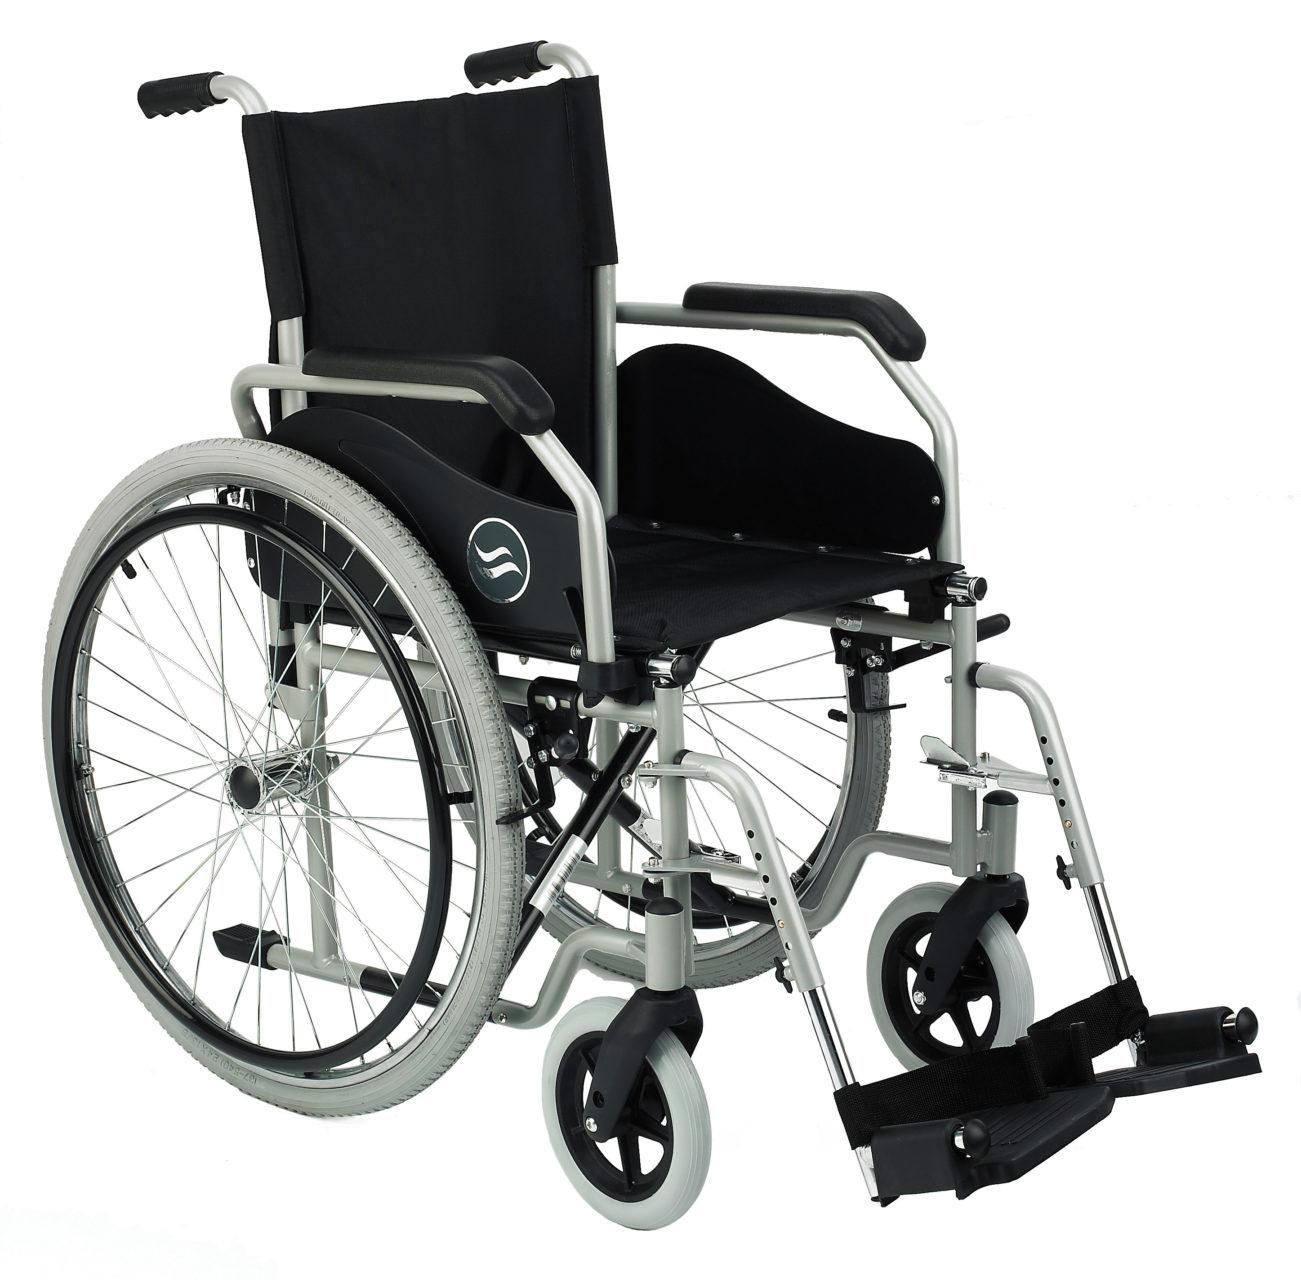 Silla de ruedas Breezy 90-0